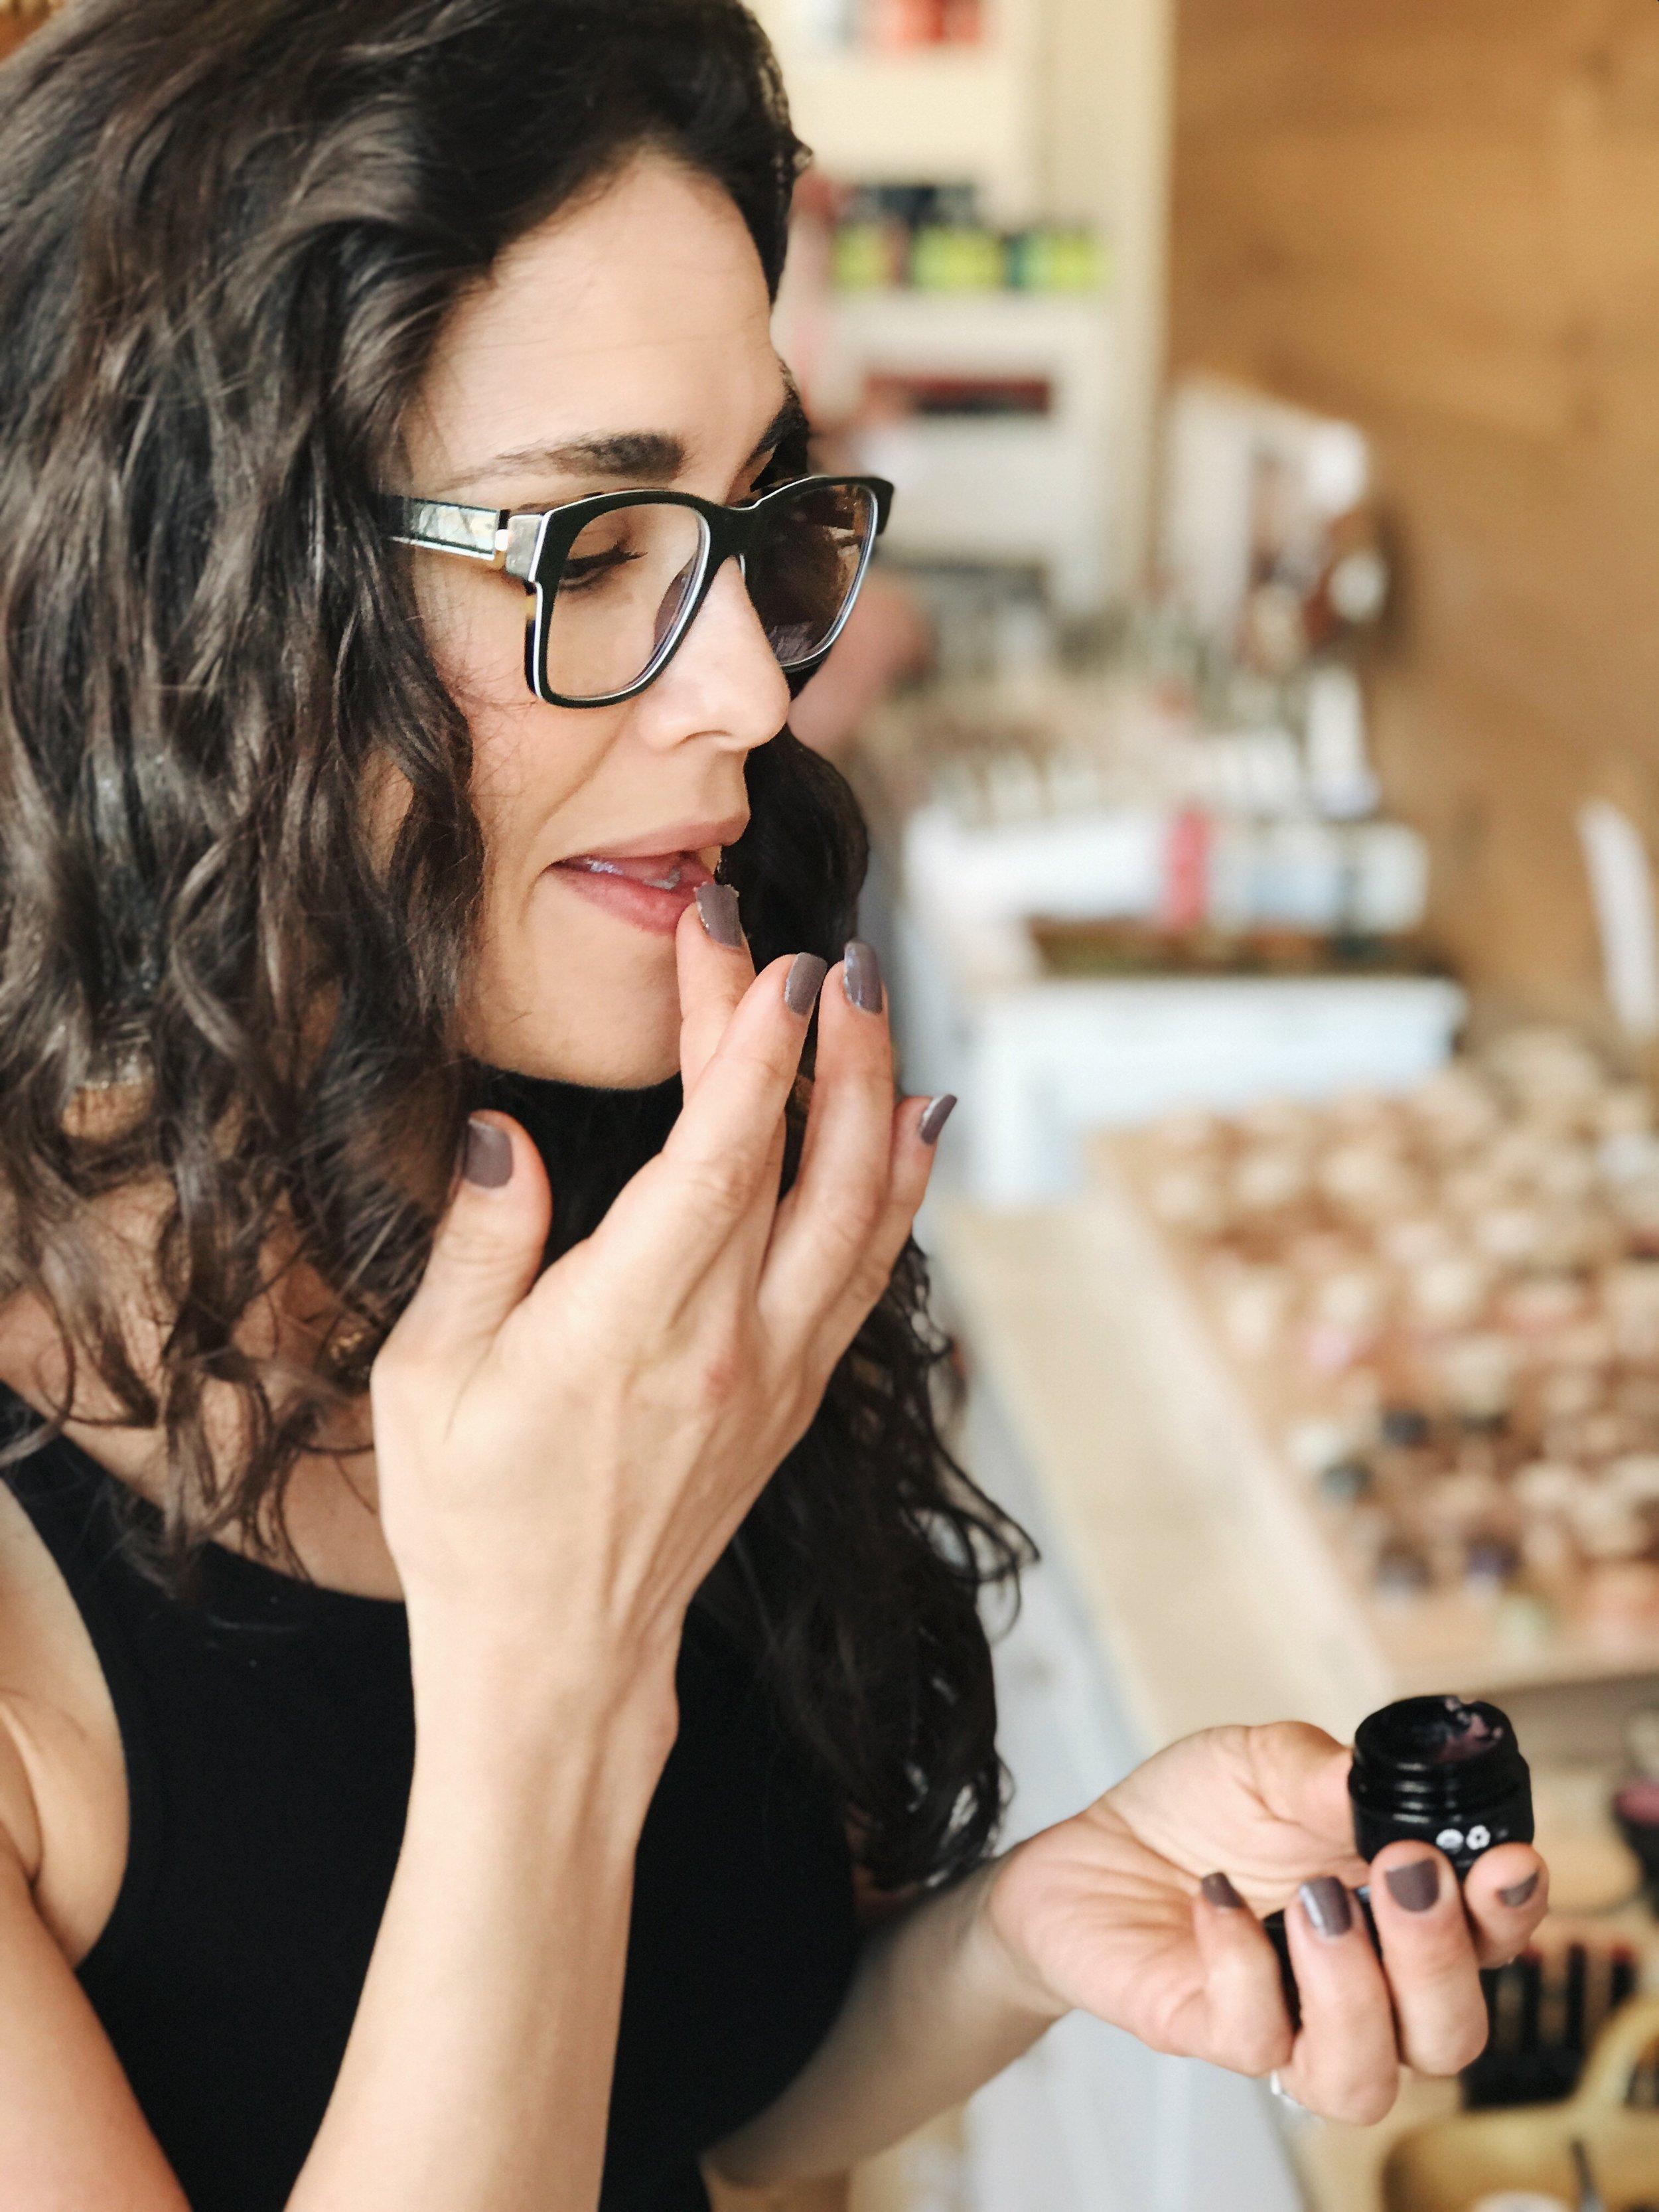 On the go Lip Exfoliating with HENNÉ Organics | janny: organically.